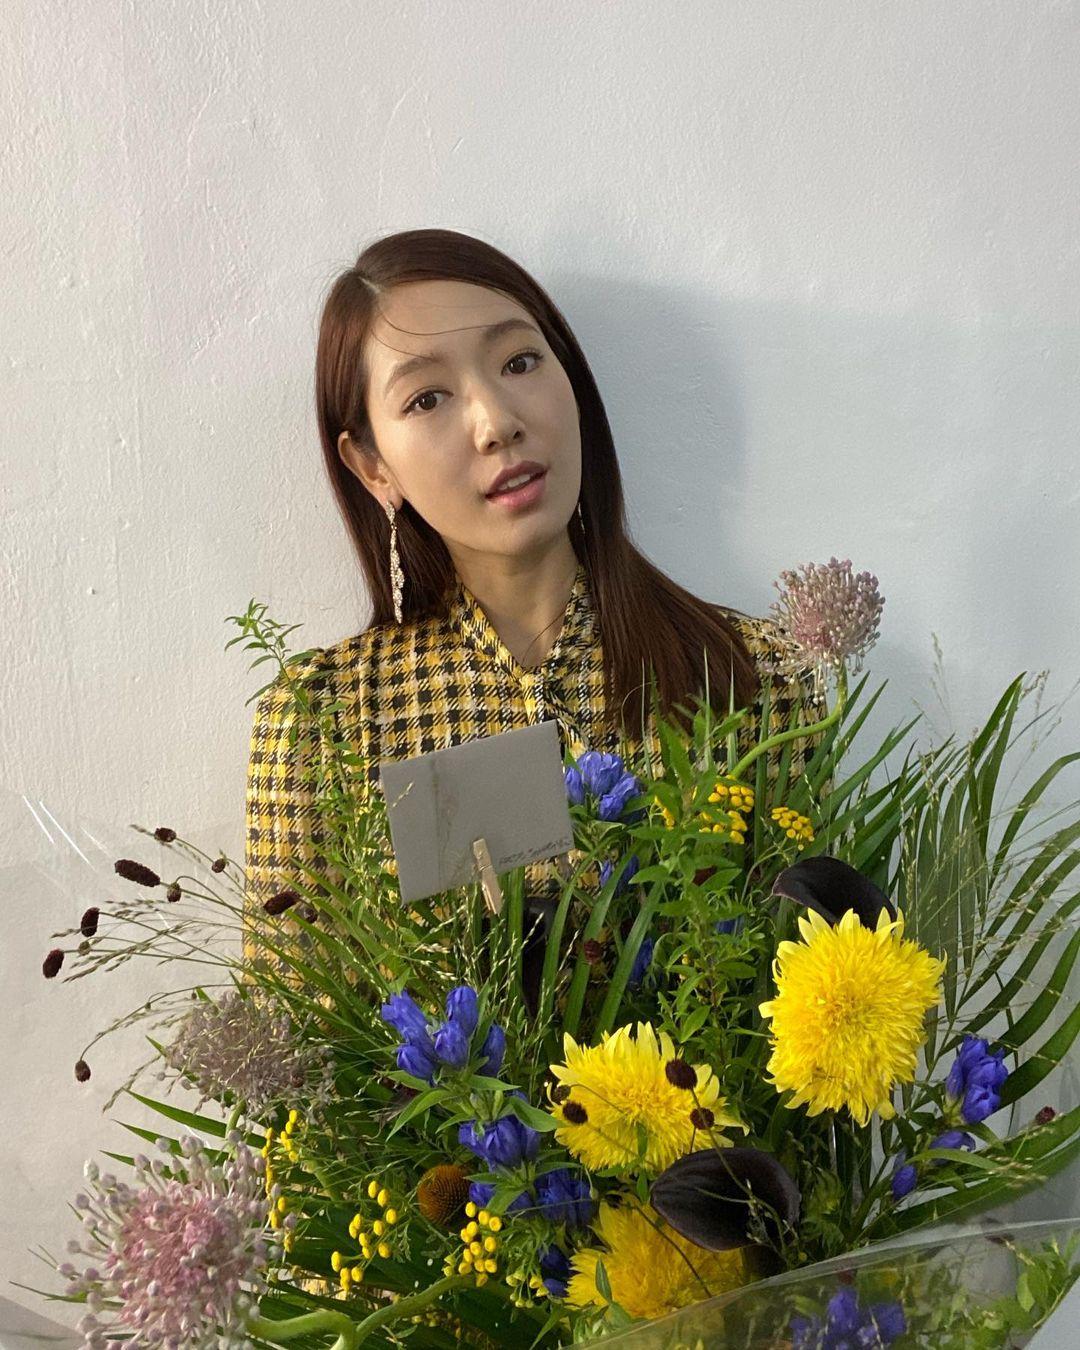 Korean actors and their childhood dreams: Park Shin Hye